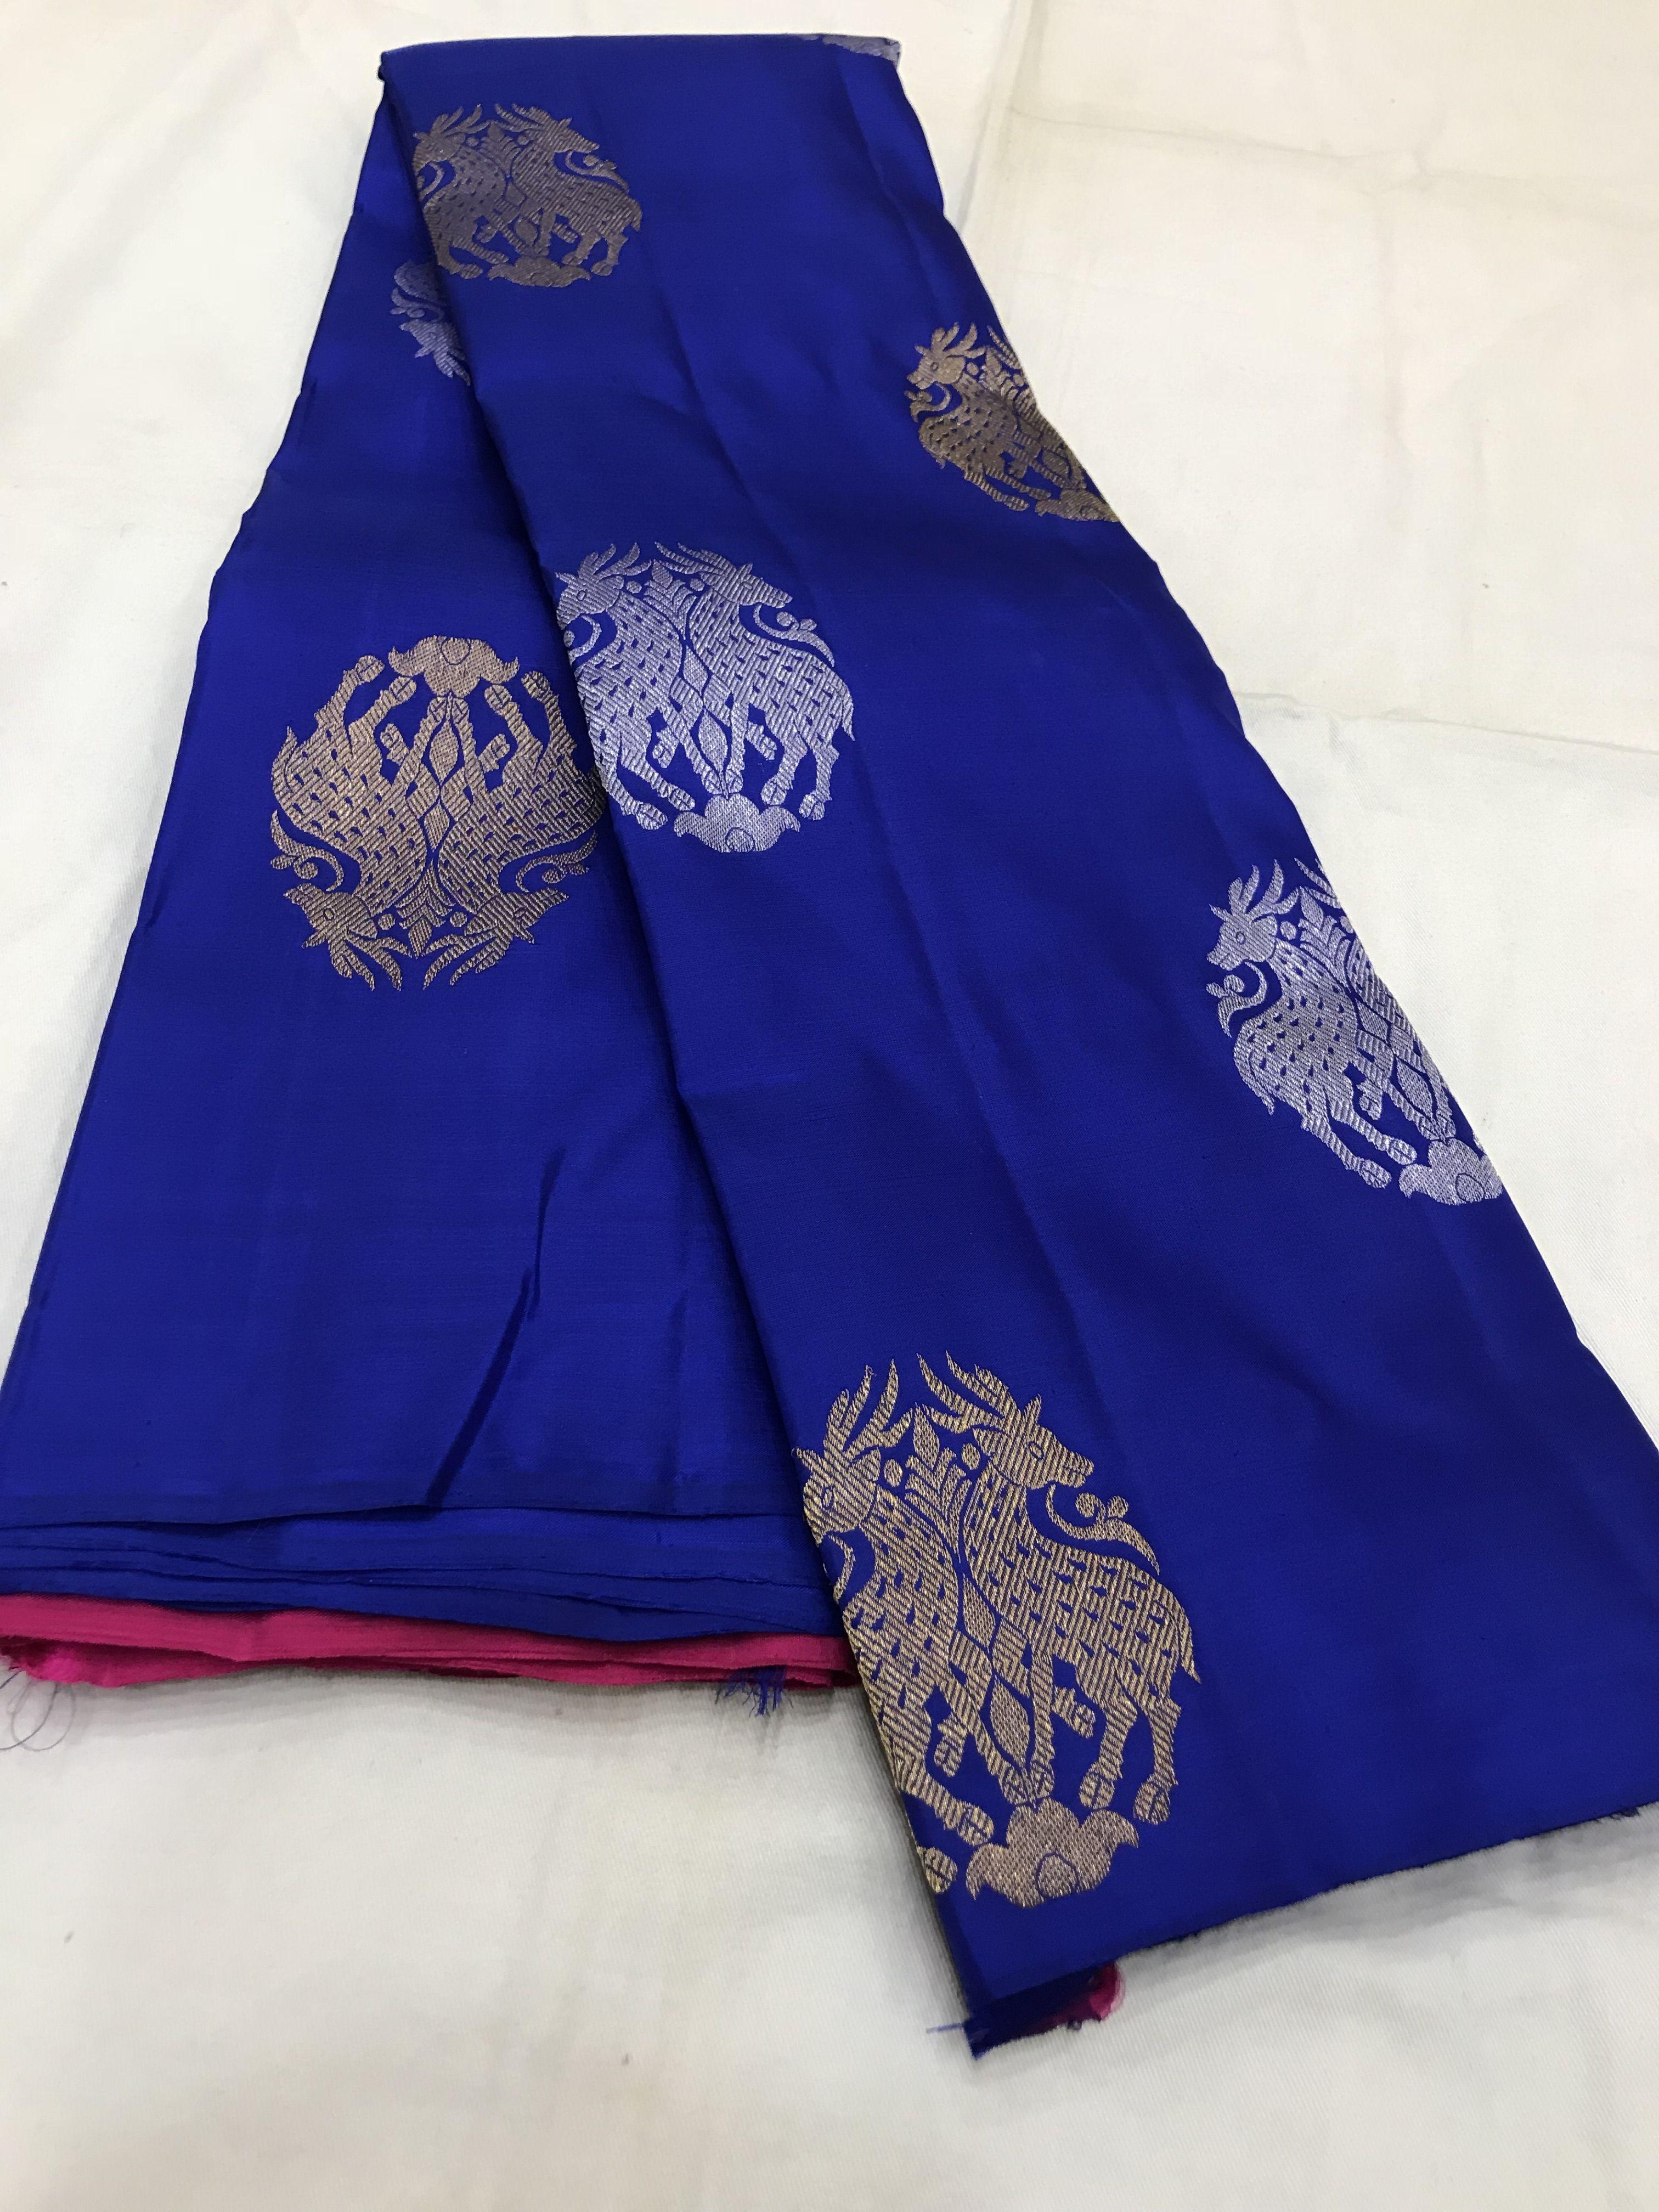 Pure silk saree 2018 pin by hemalatha on blouse blouses in   pinterest  saree